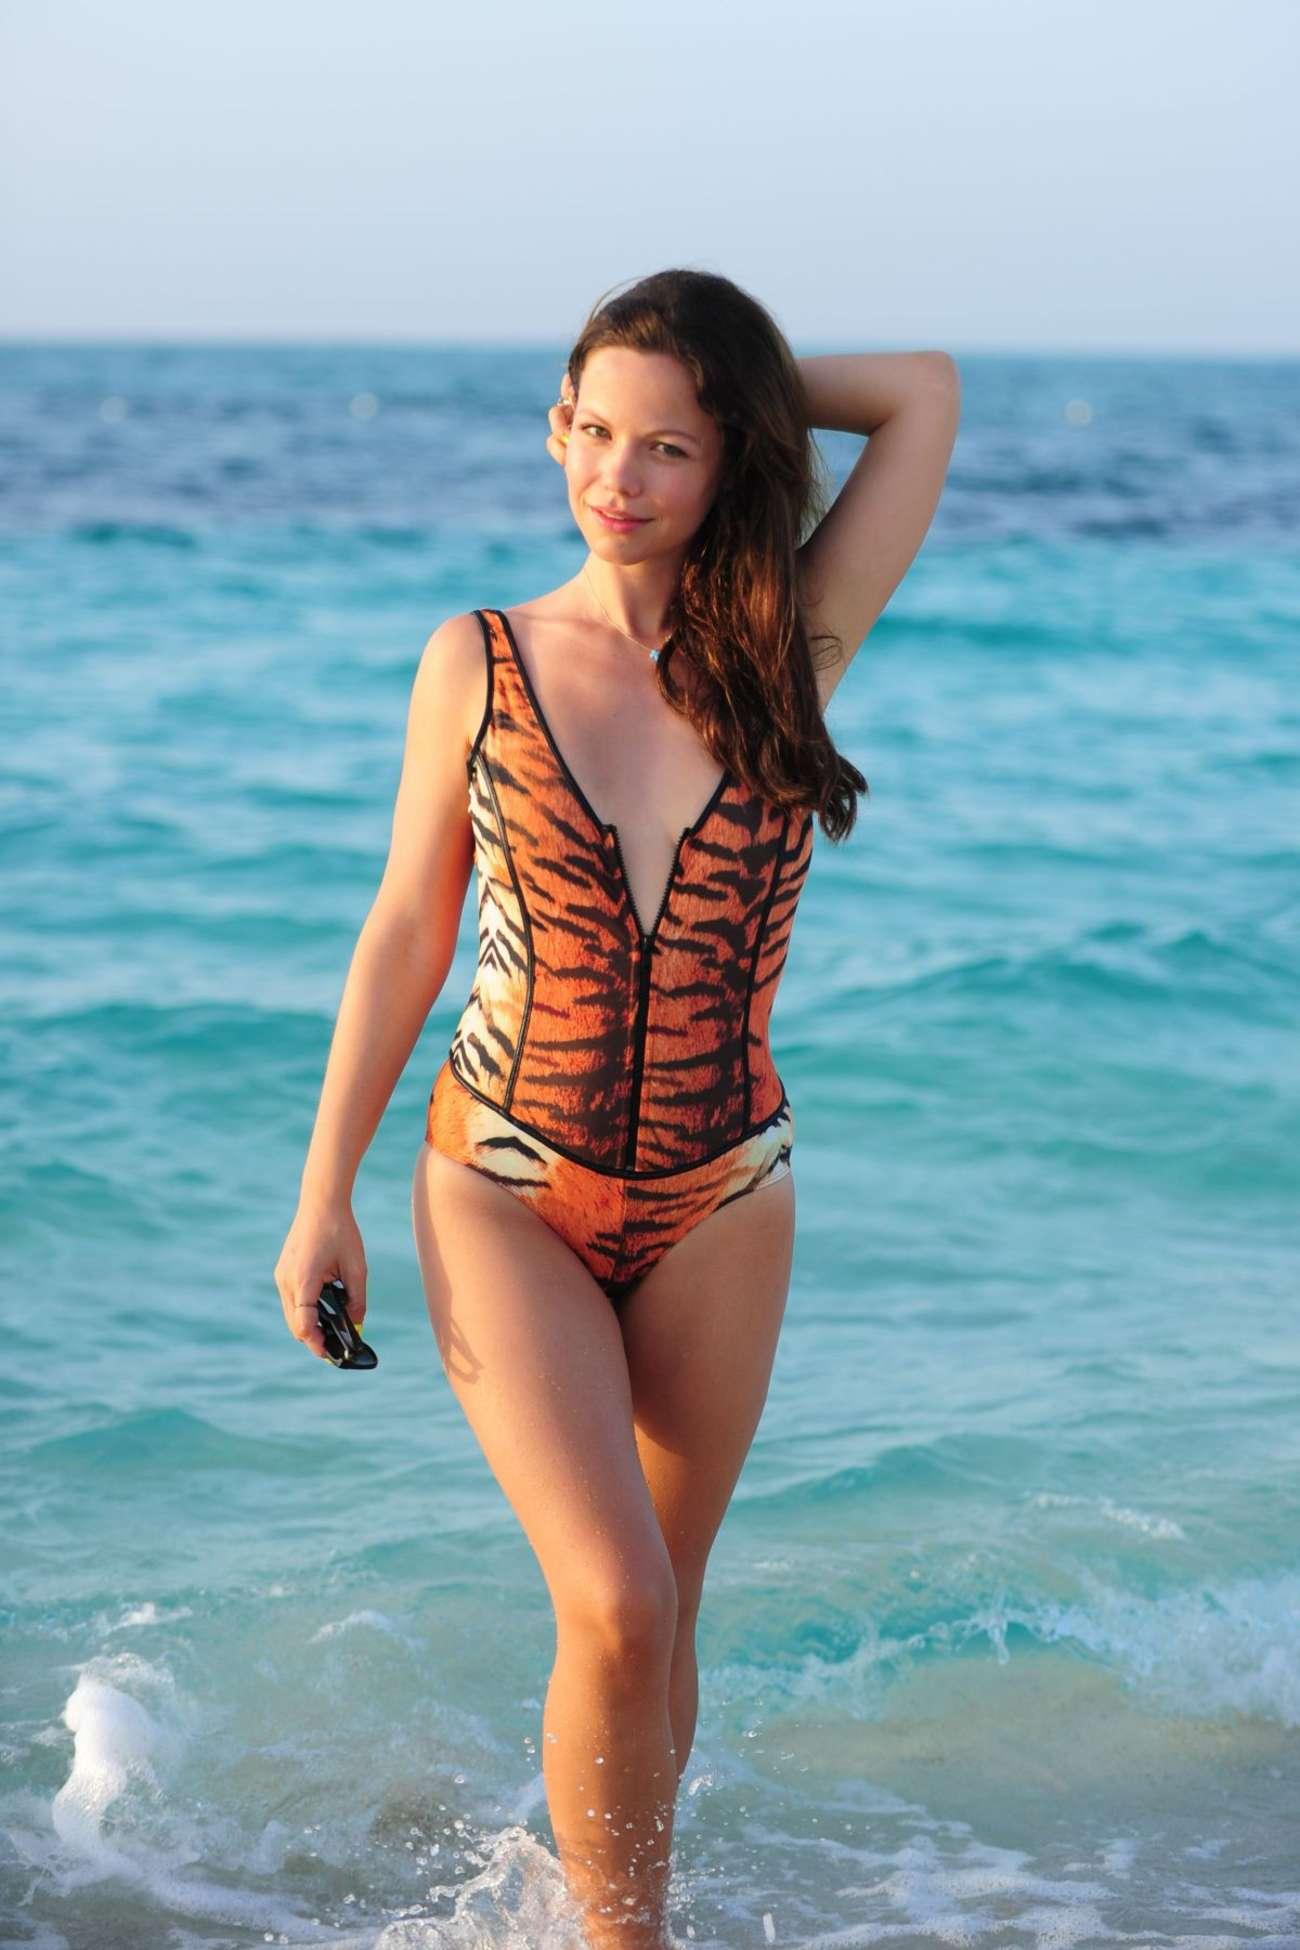 Tammin Sursok 2015 : Tammin Sursok in Bikinis -18